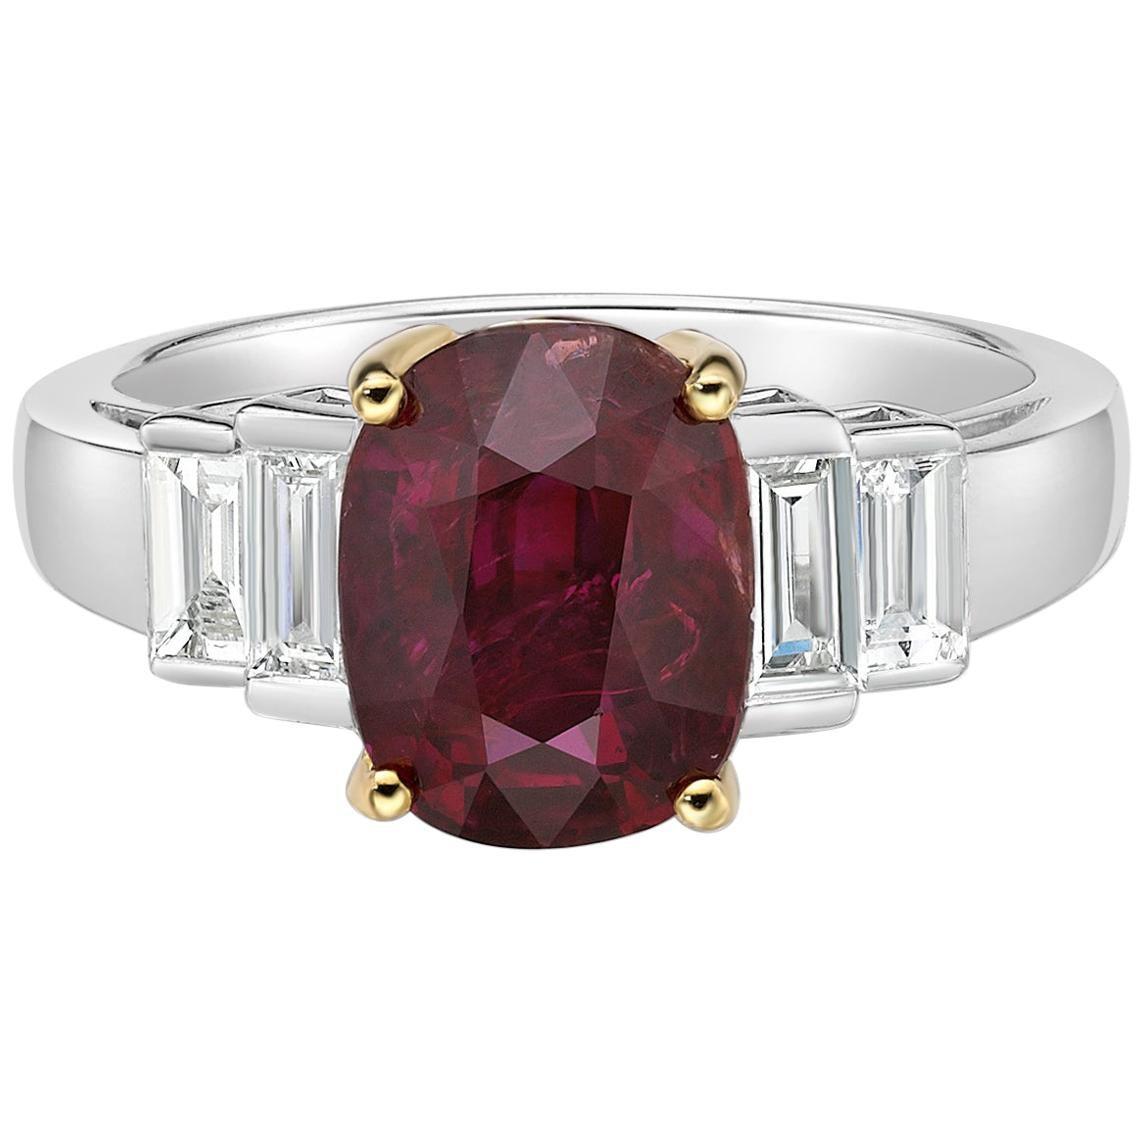 3.51 Carat  Ruby GIA Certified Unheated Diamond Ring Oval Cut